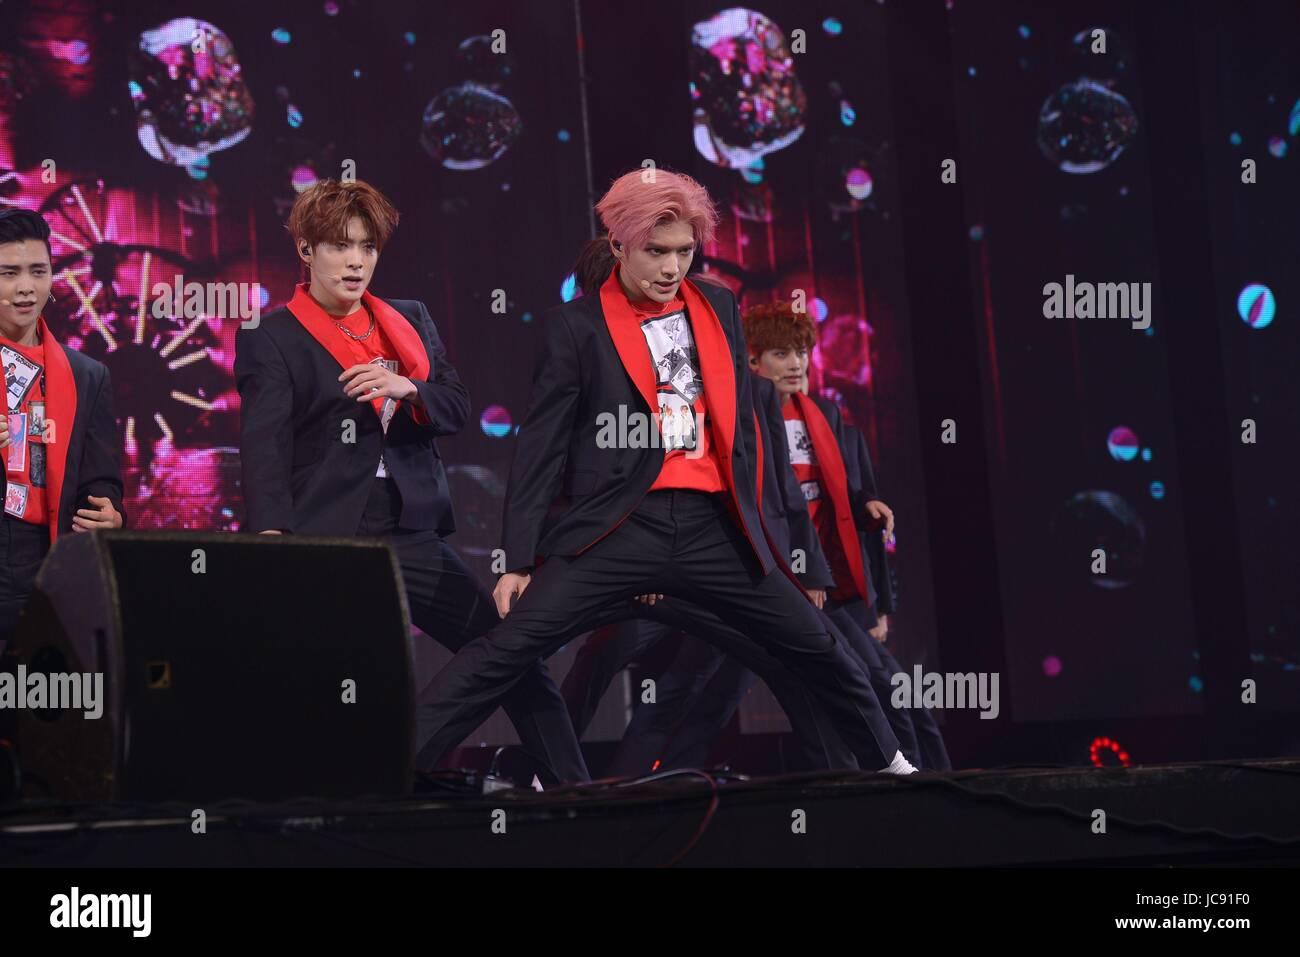 Seoul Korea 14th June 2017 Nct 127 Promotes For Their 3rd Mini